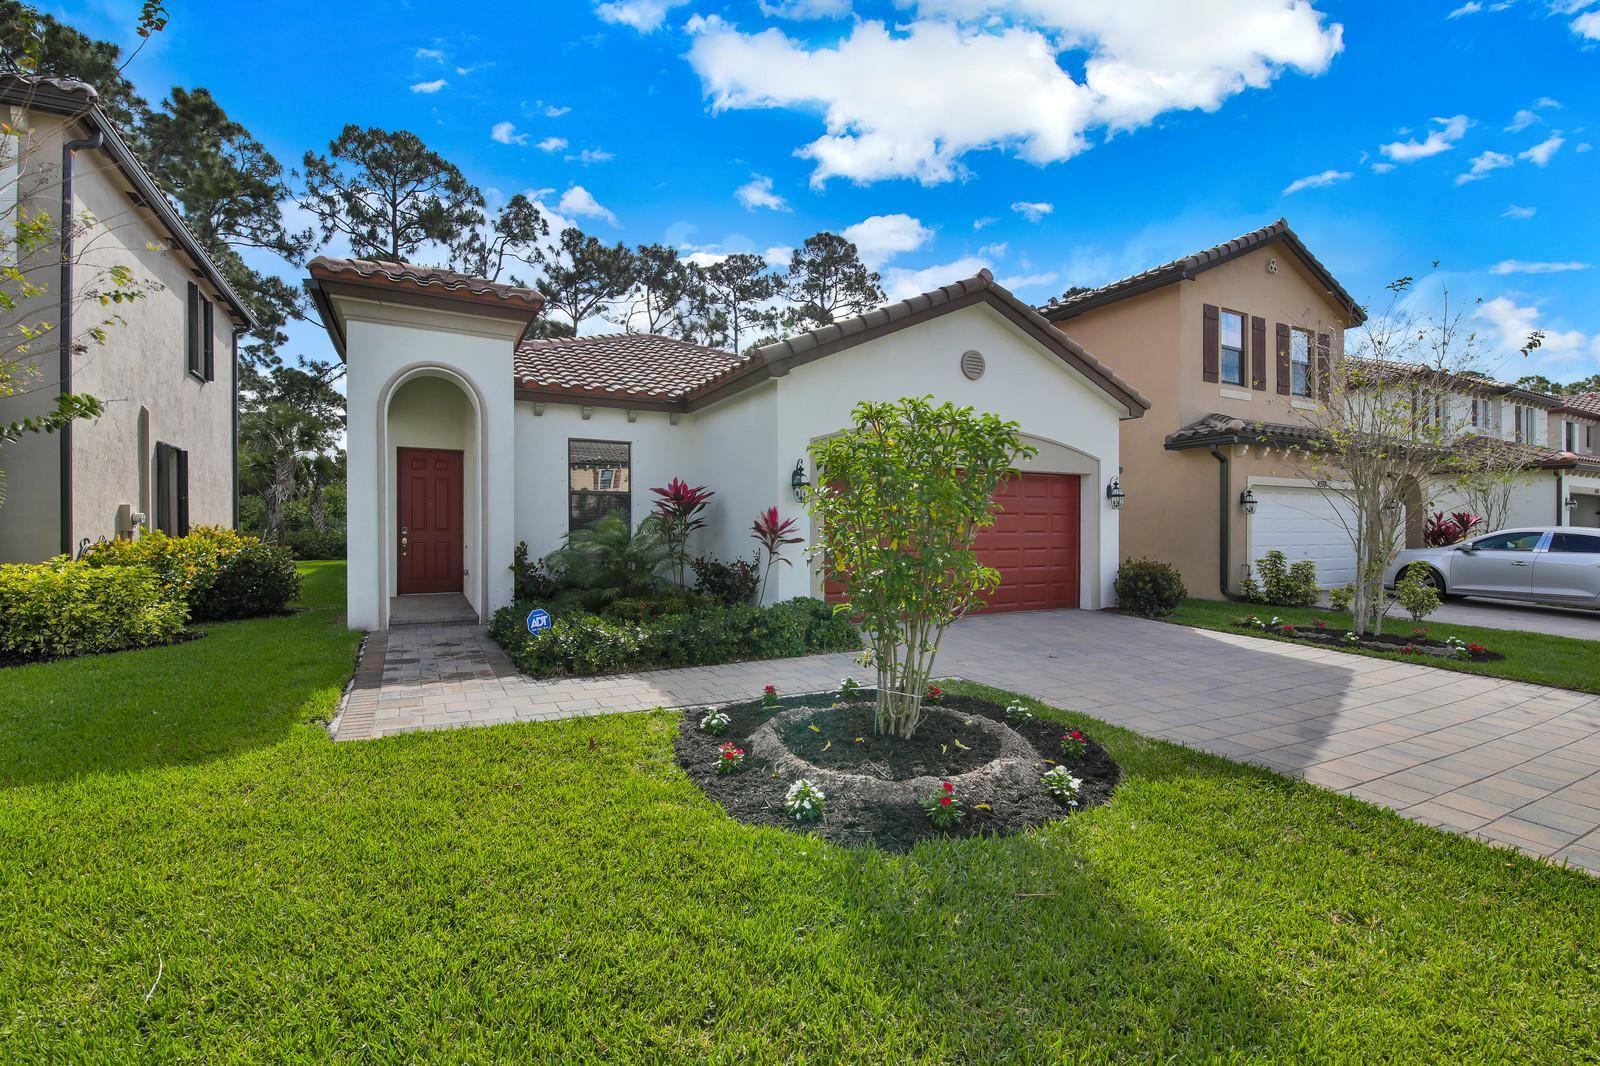 4370 Buena Tara Drive, West Palm Beach, FL 33413 - #: RX-10611327